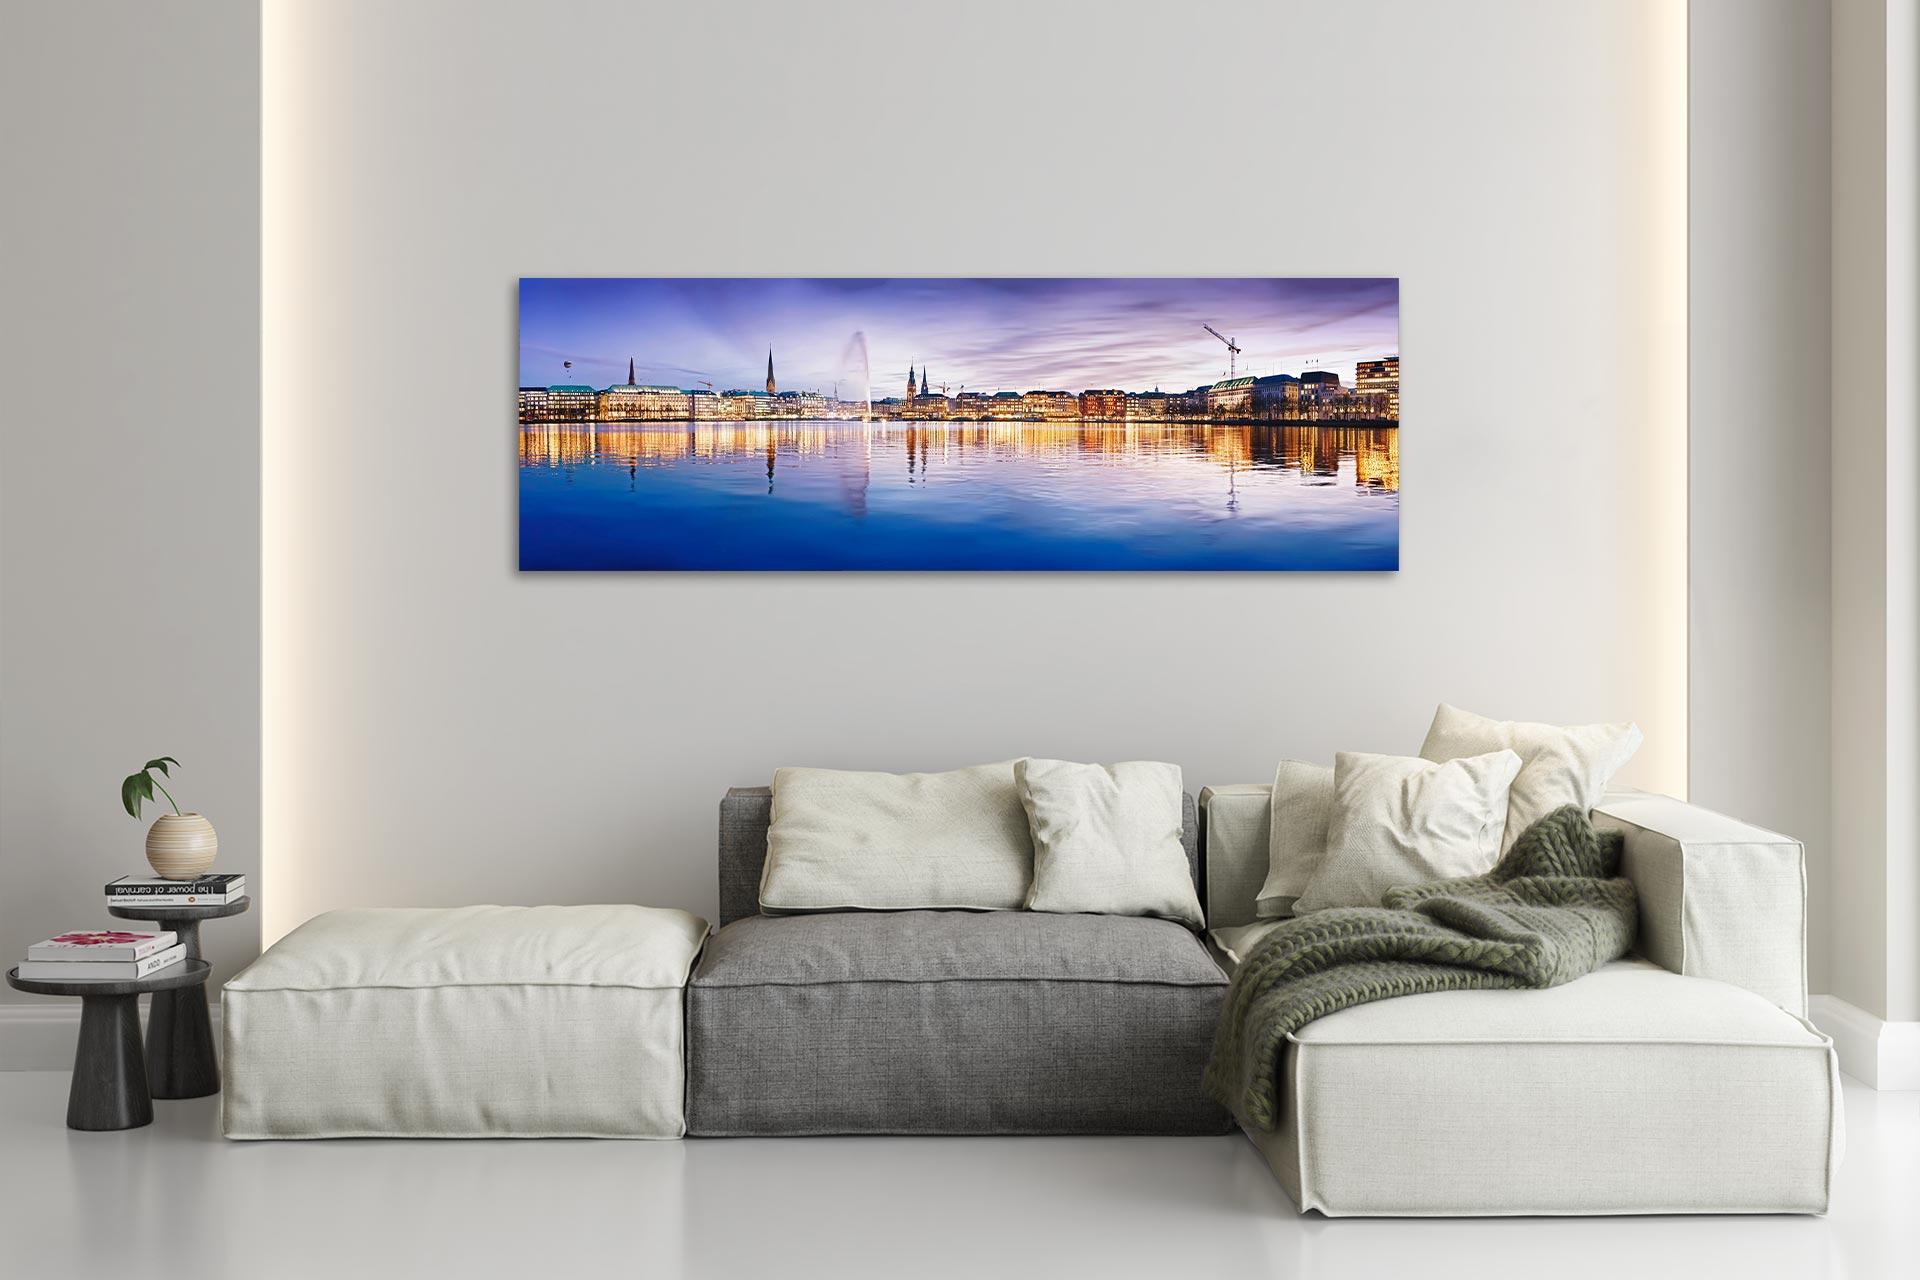 TG075-binnenalster-panorama-leinwand-acrylglas-aludibond-wohnzimmer